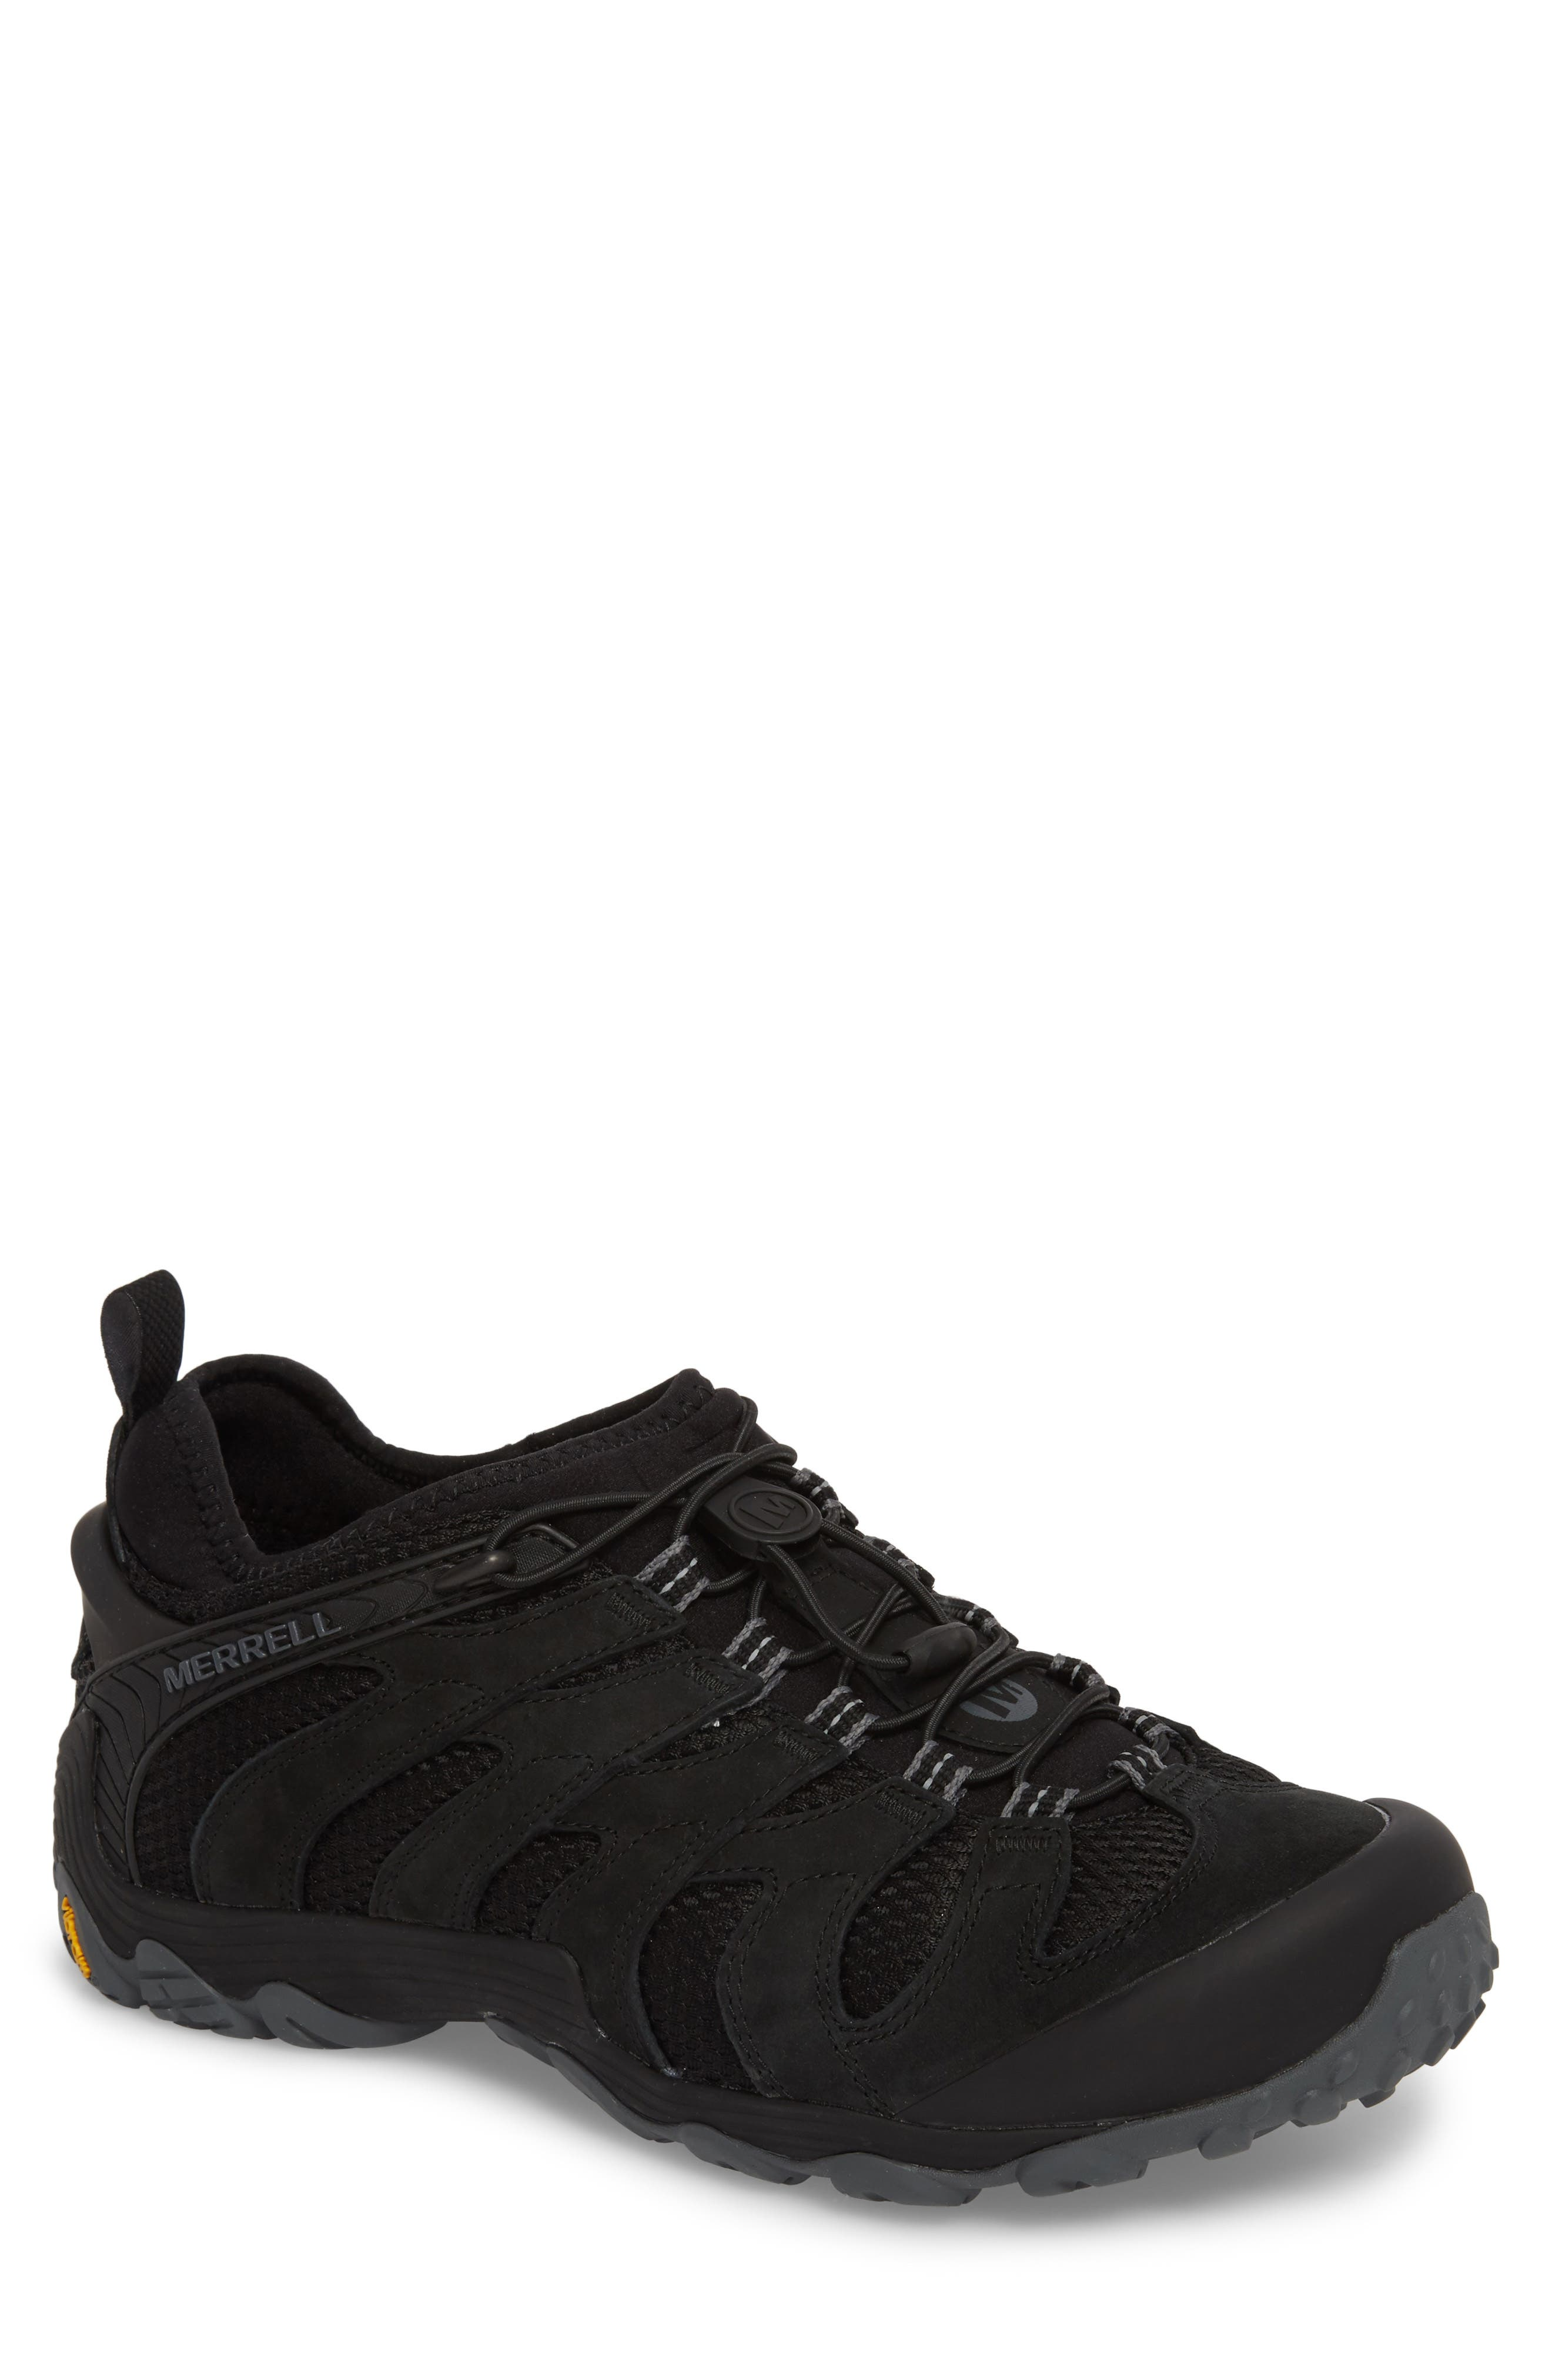 MERRELL Chameleon 7 Stretch Hiking Shoe, Main, color, BLACK